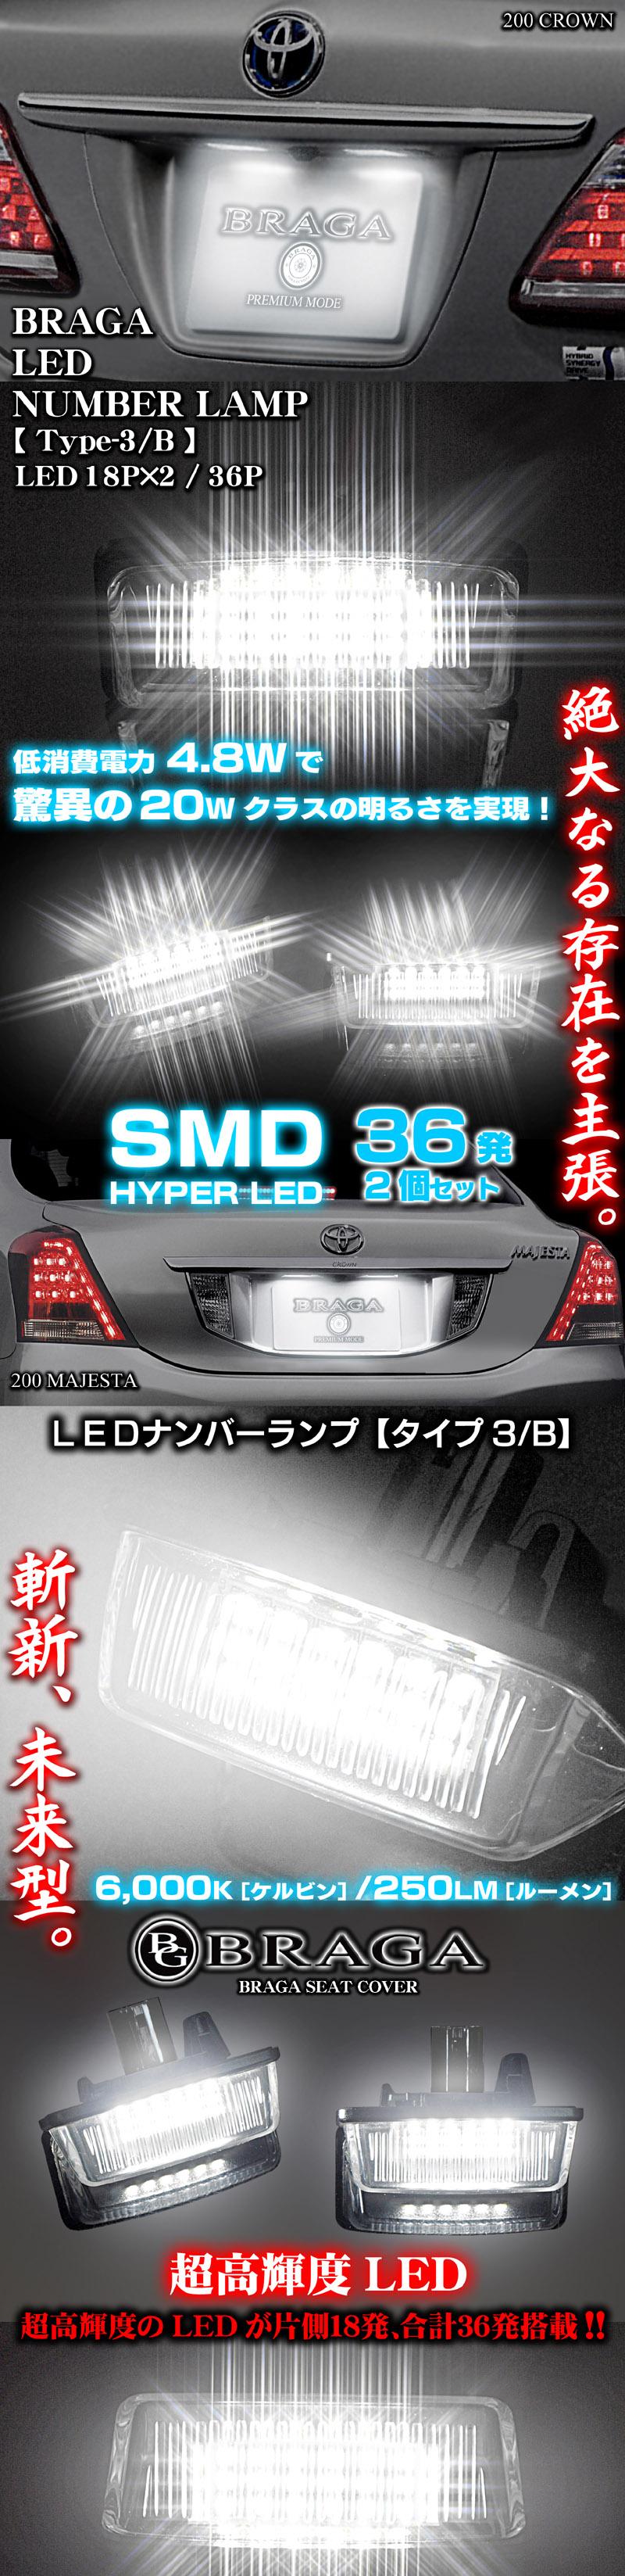 LEDナンバーランプ灯[タイプ3/B]LEDナンバーランプ灯【トヨタ車】ライセンスランプ・左右2個セット/片側18発/合計36発